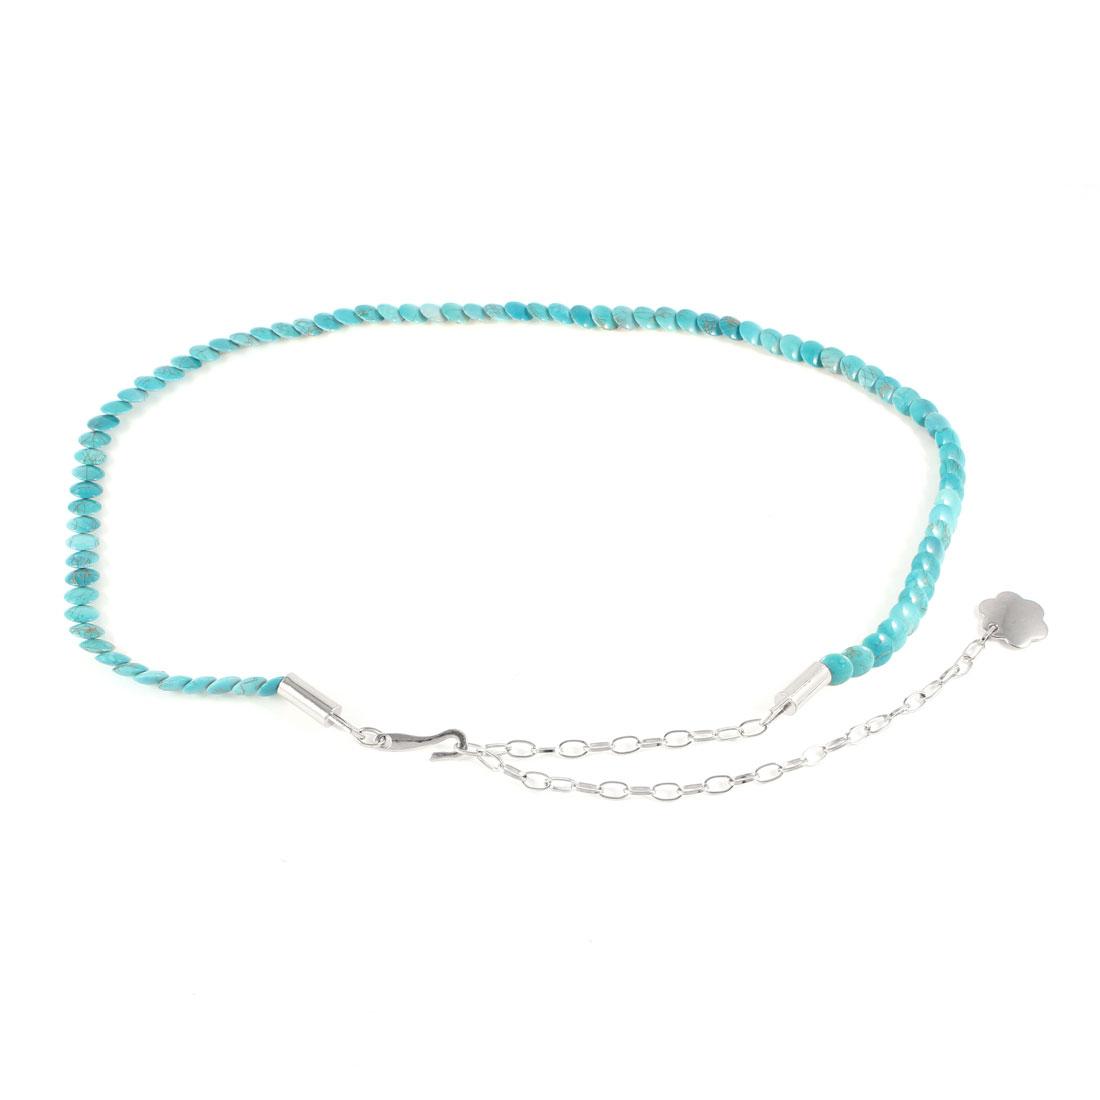 Lady Ornament Light Blue Round Plastic Beads Decor Adjustable Waist Chain Belt